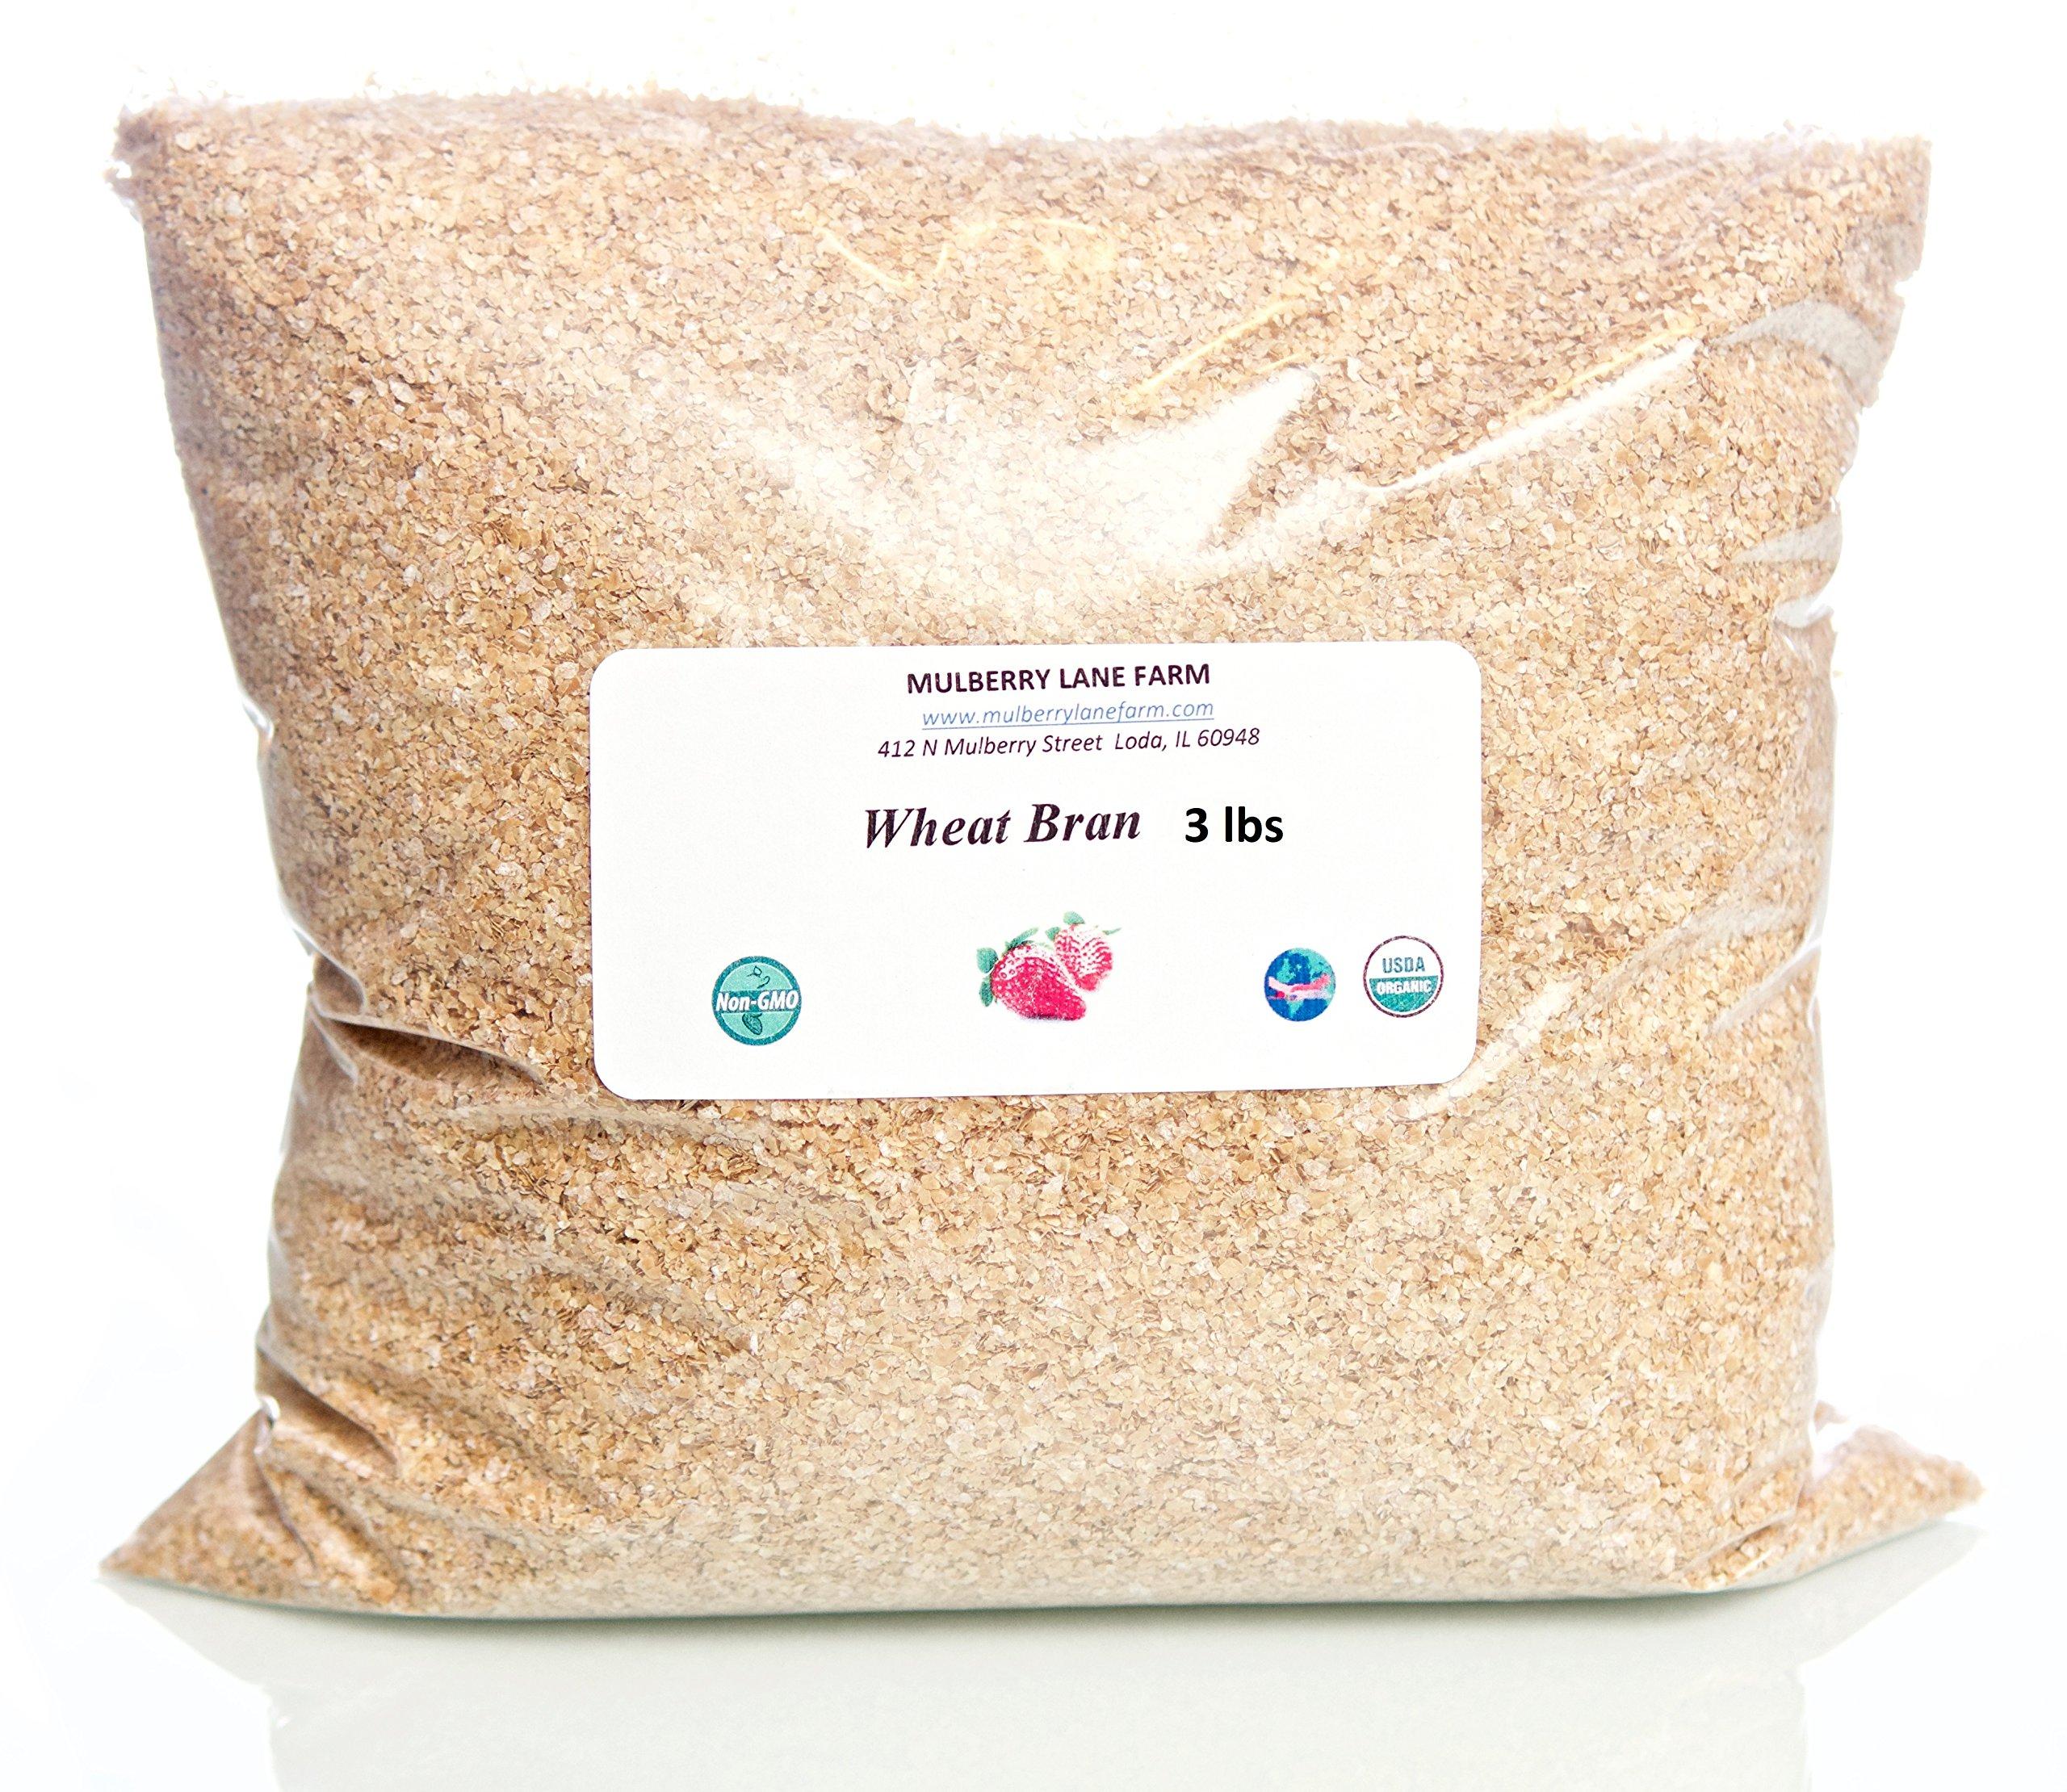 Wheat Bran, 48 ounces, or 3 lbs (three pounds), USDA Certified Organic, Non-GMO, BULK.